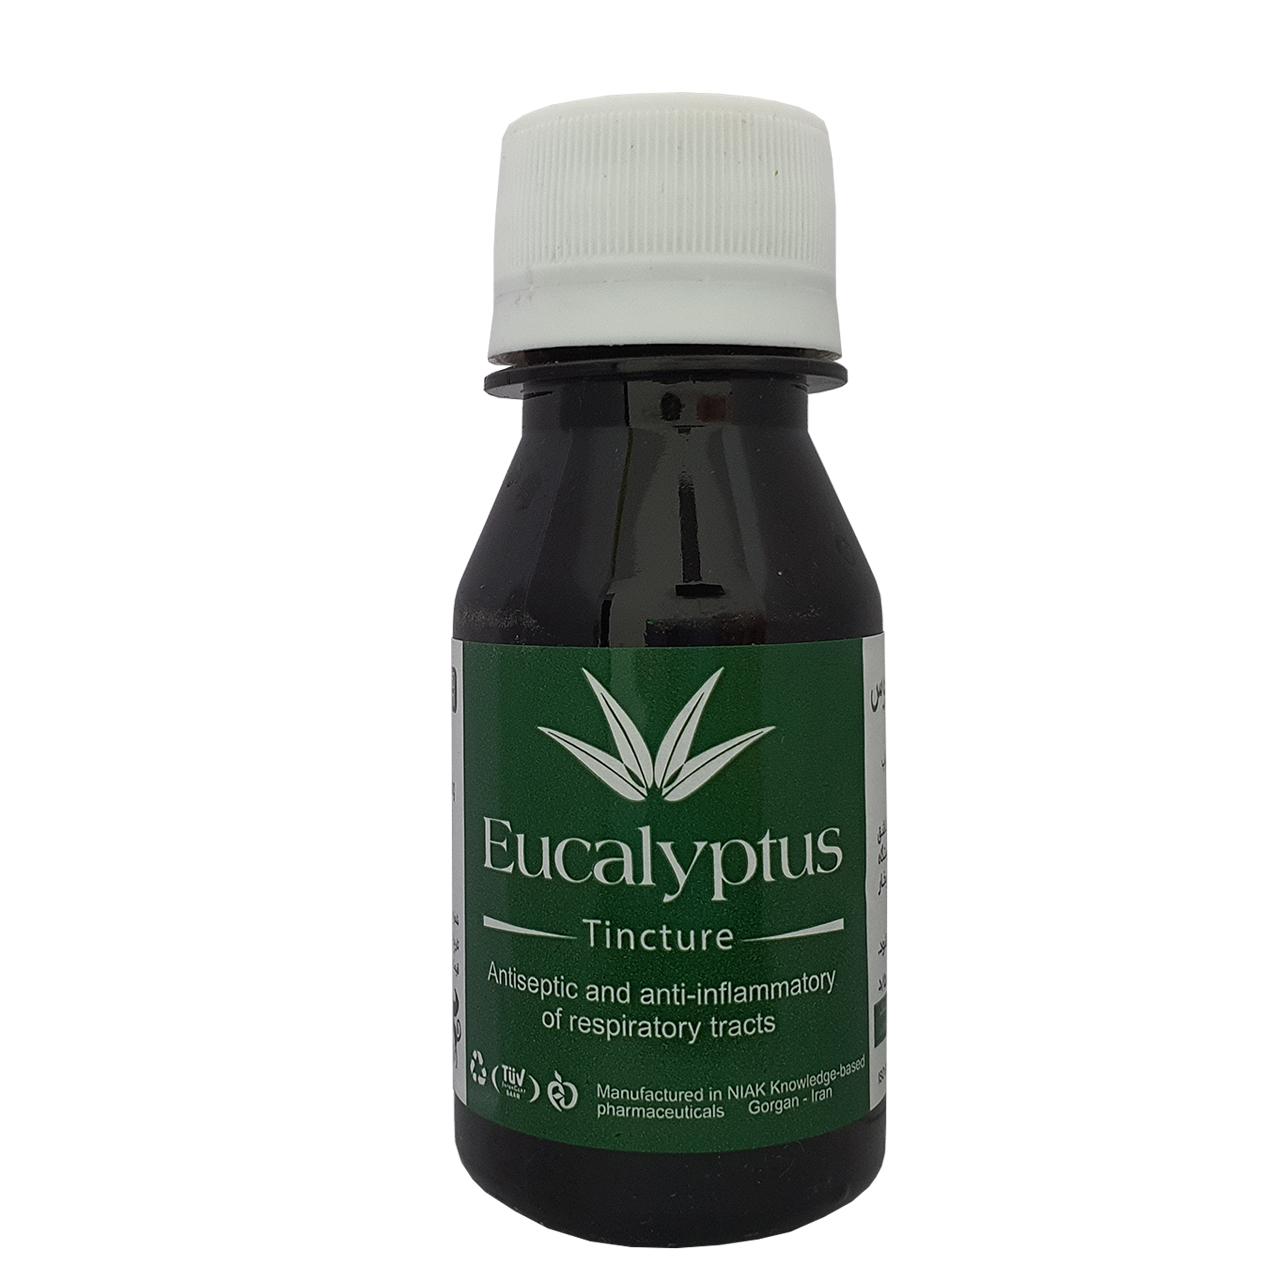 محلول بخور اکالیپتوس نیاک مدل Eucalyptus حجم 60 میلی لیتر